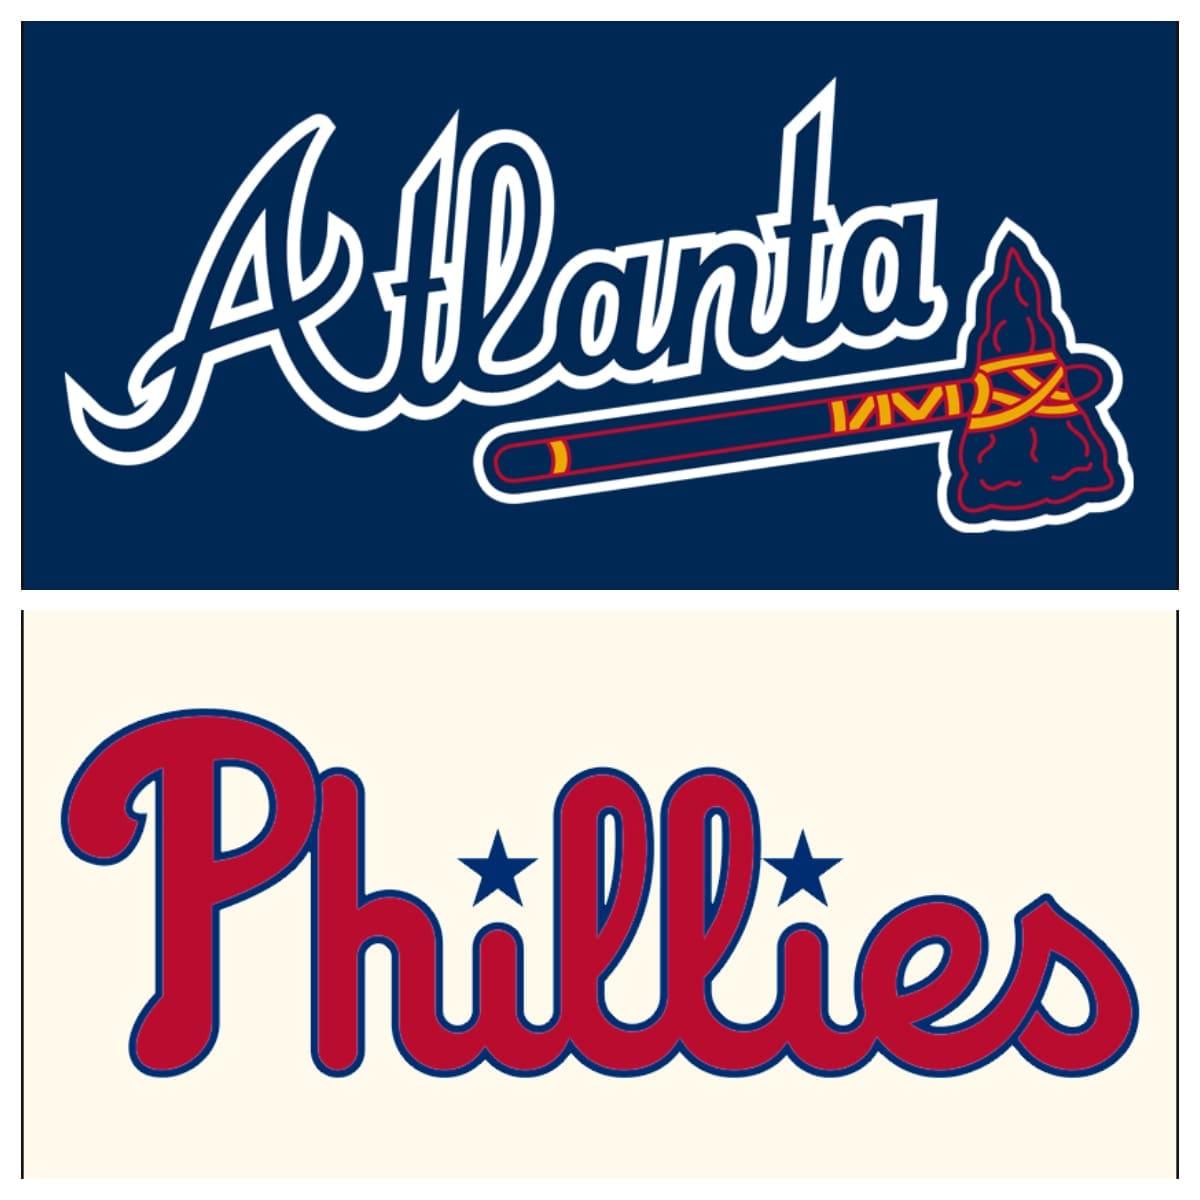 Atlanta Braves vs Philadelphia Phillies Stats